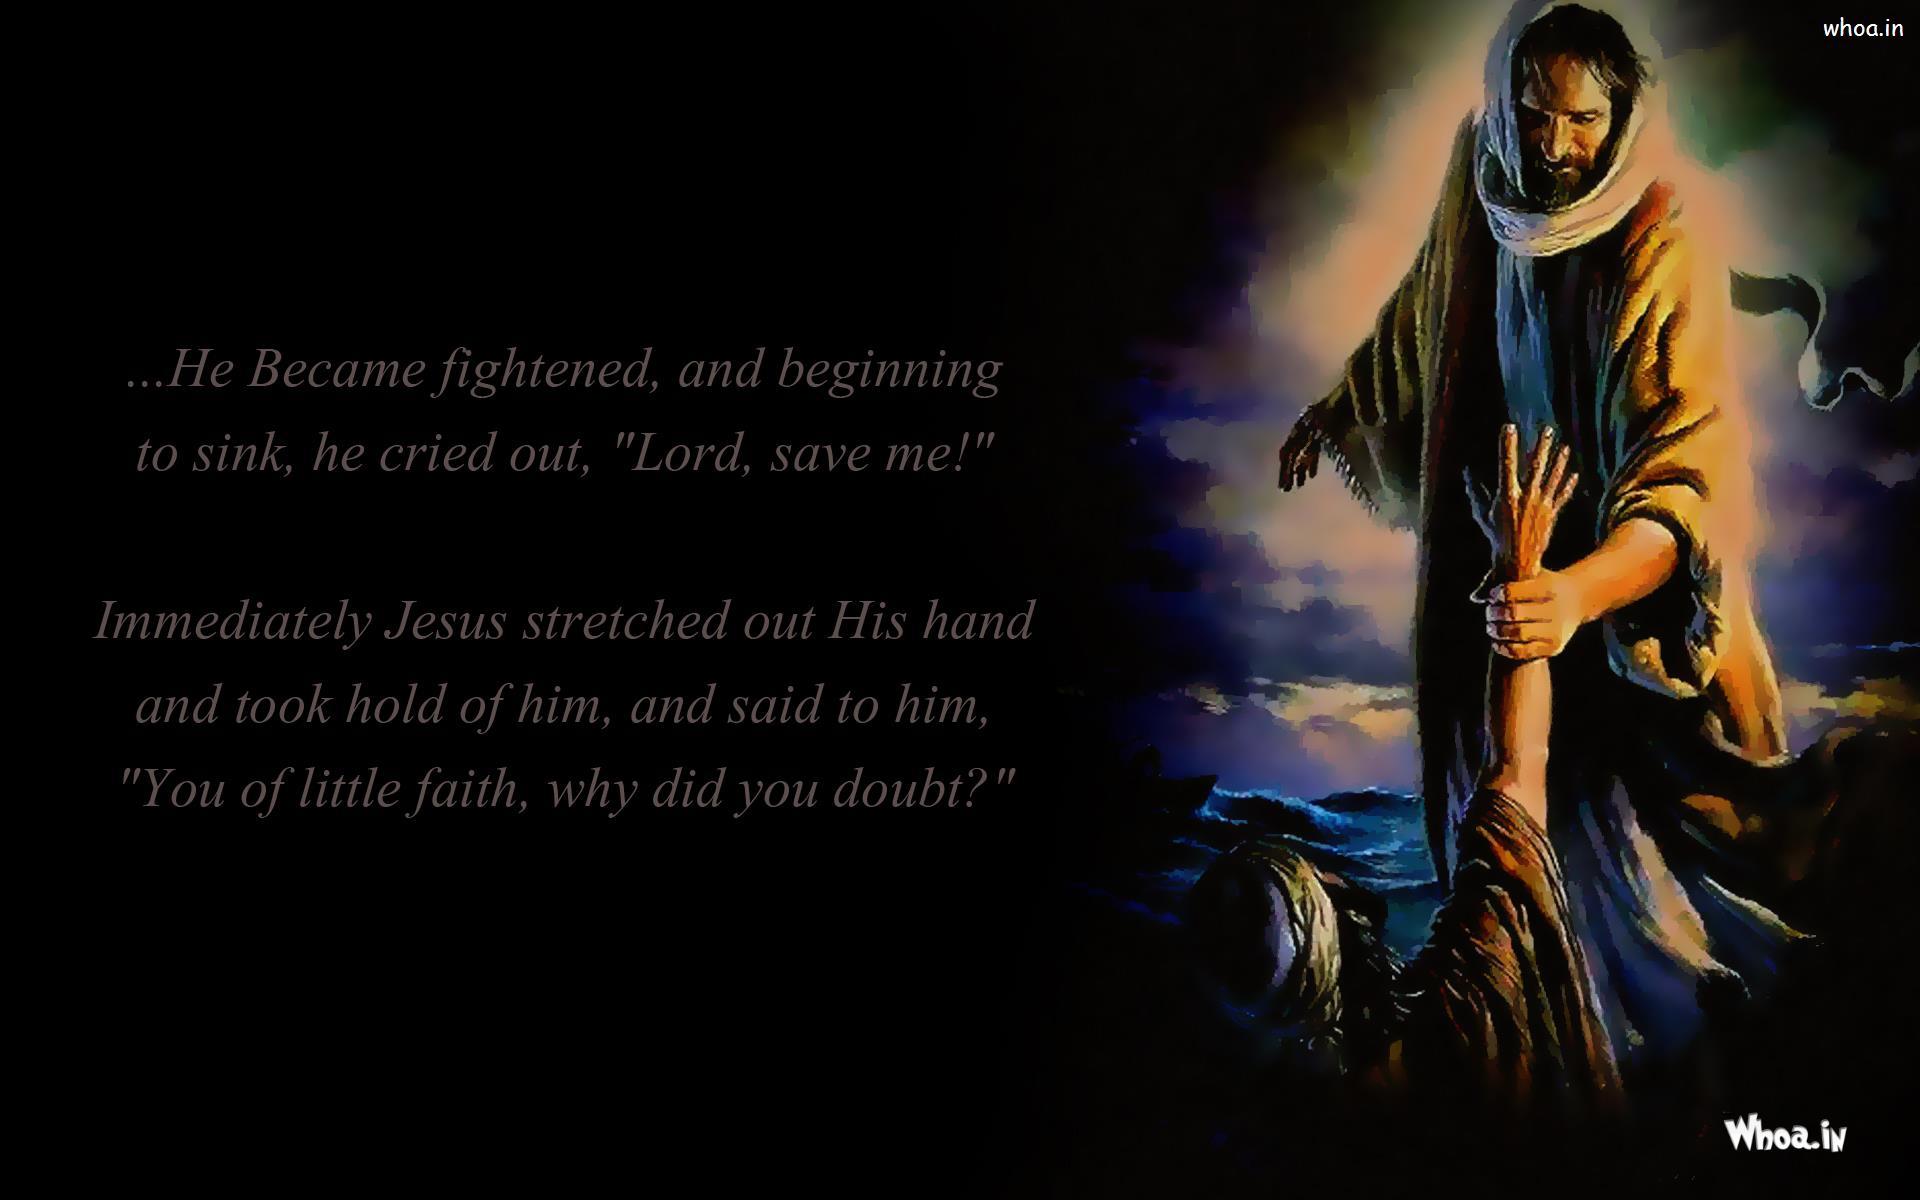 jesus christ stretched out stranger hand hd wallpaper